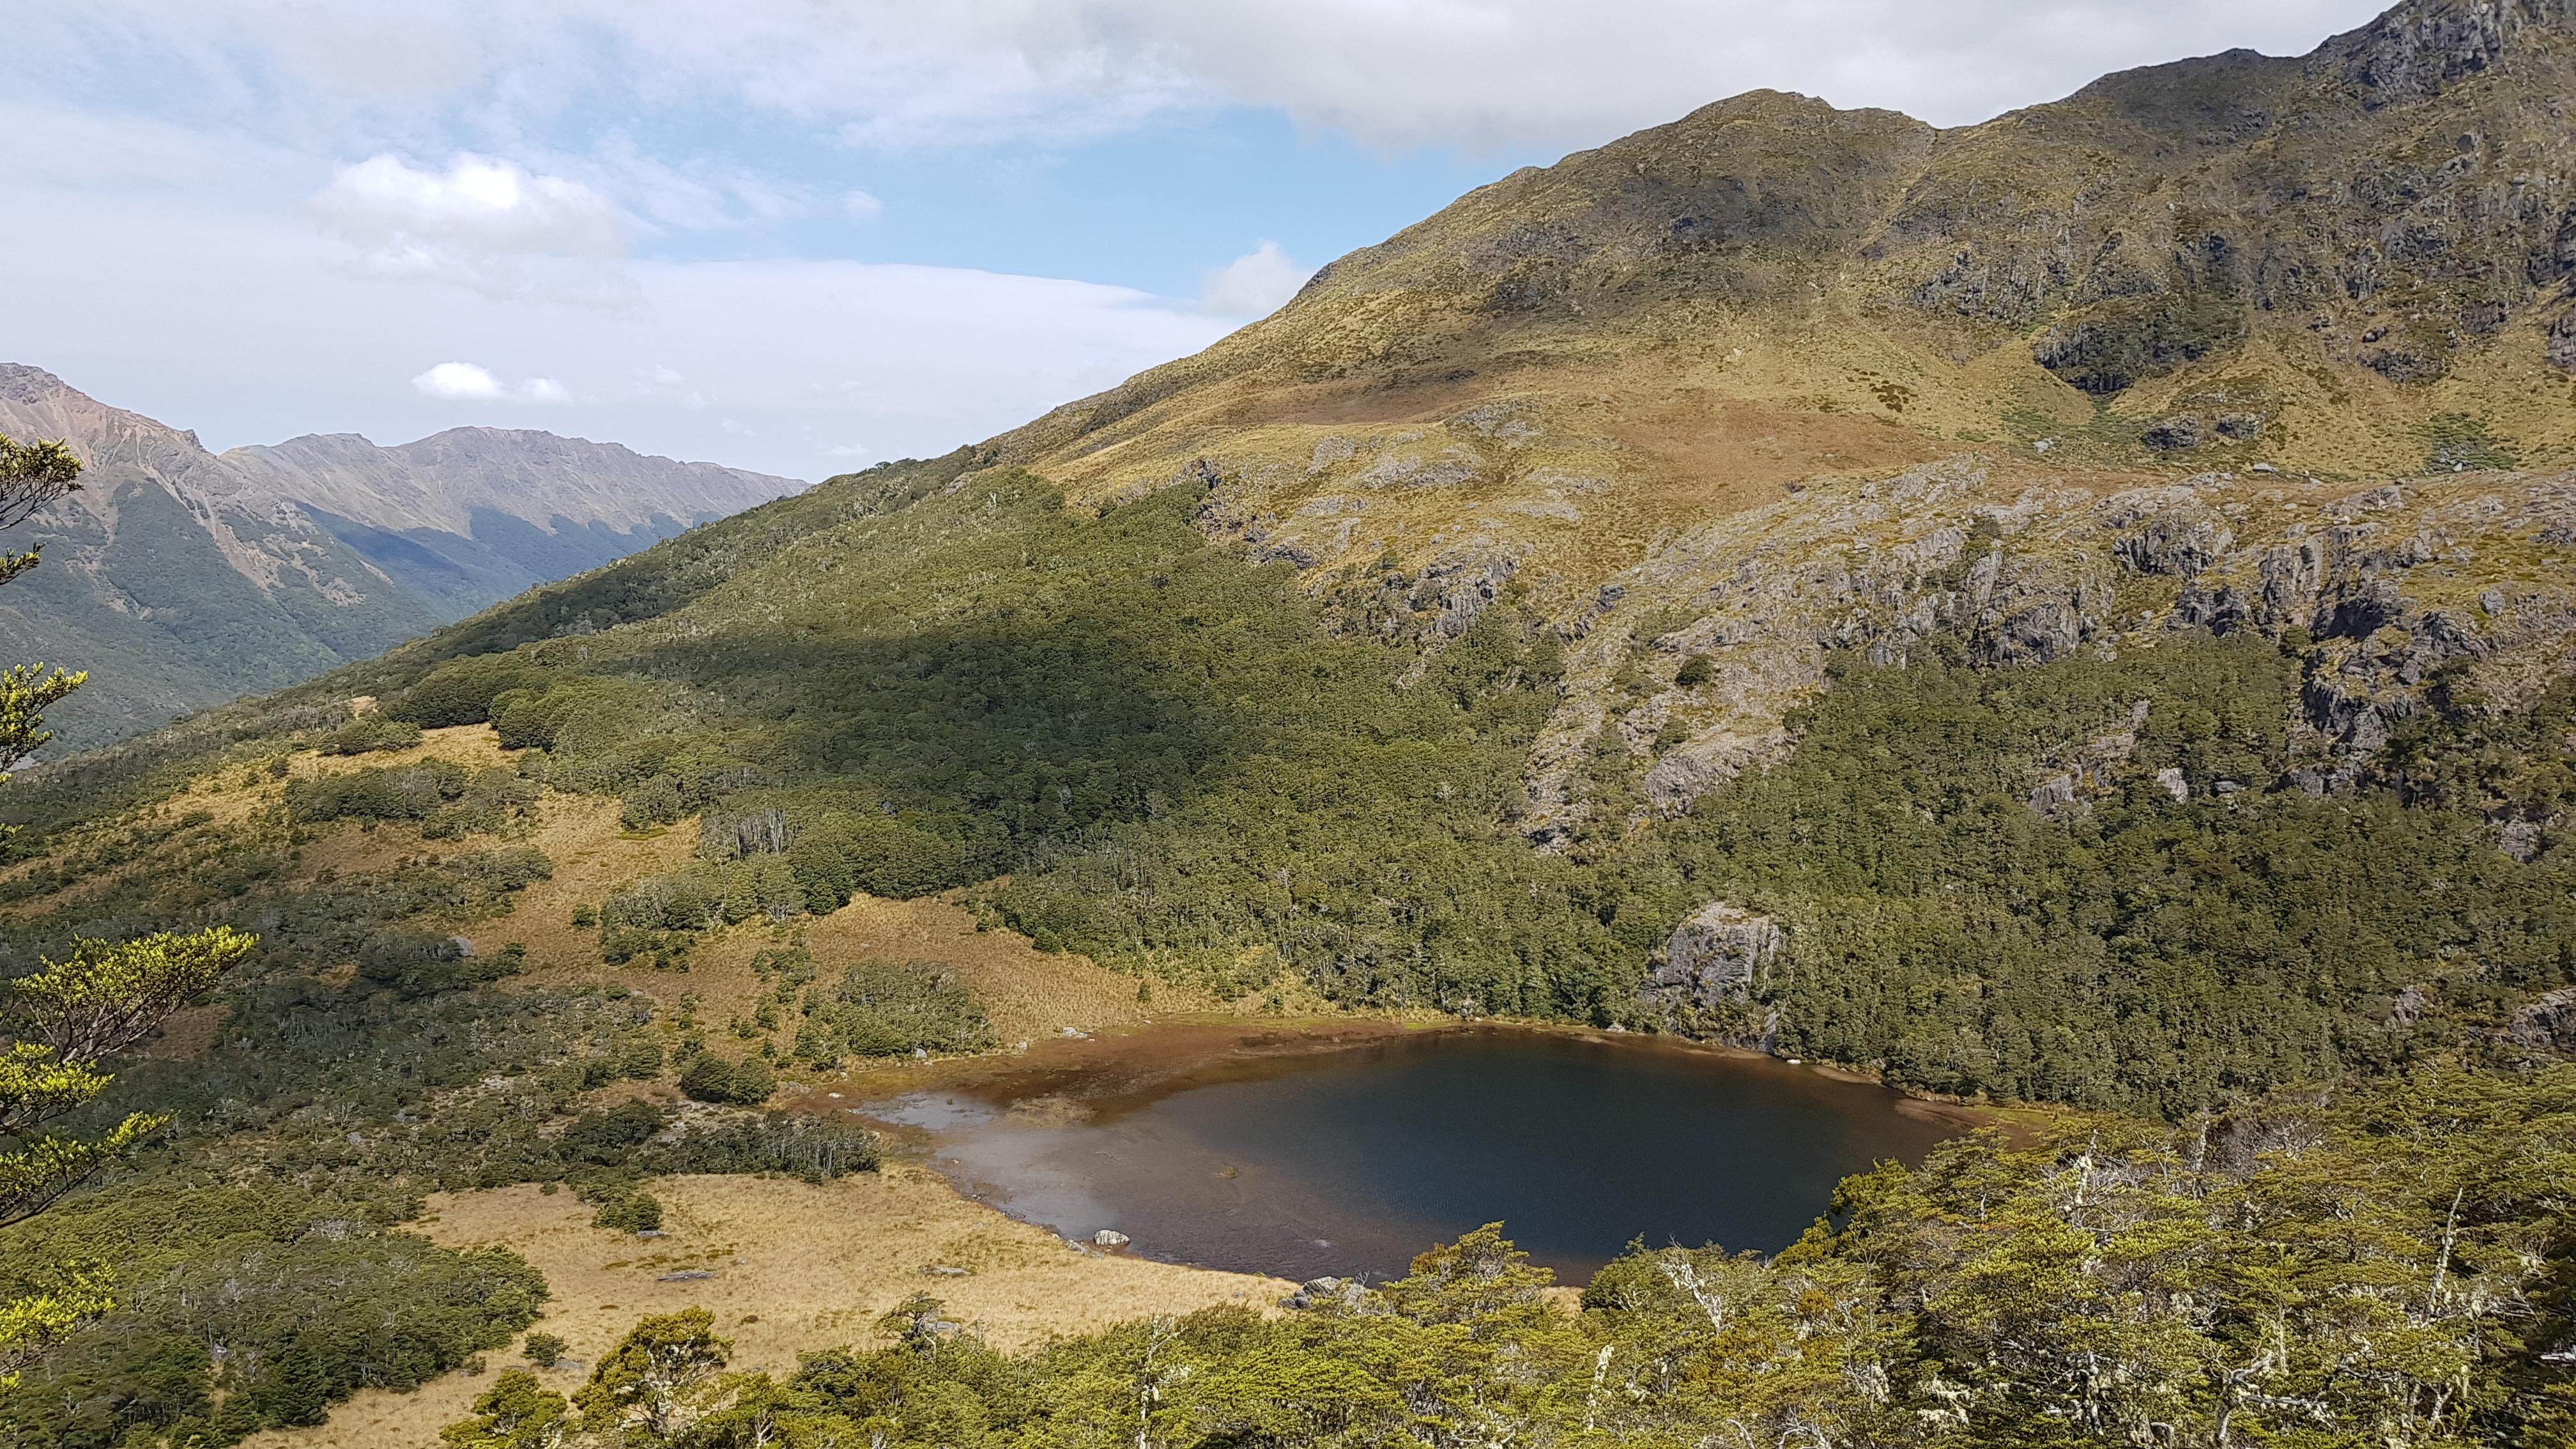 Camp Lake - The Peel Range Kahurangi National Park